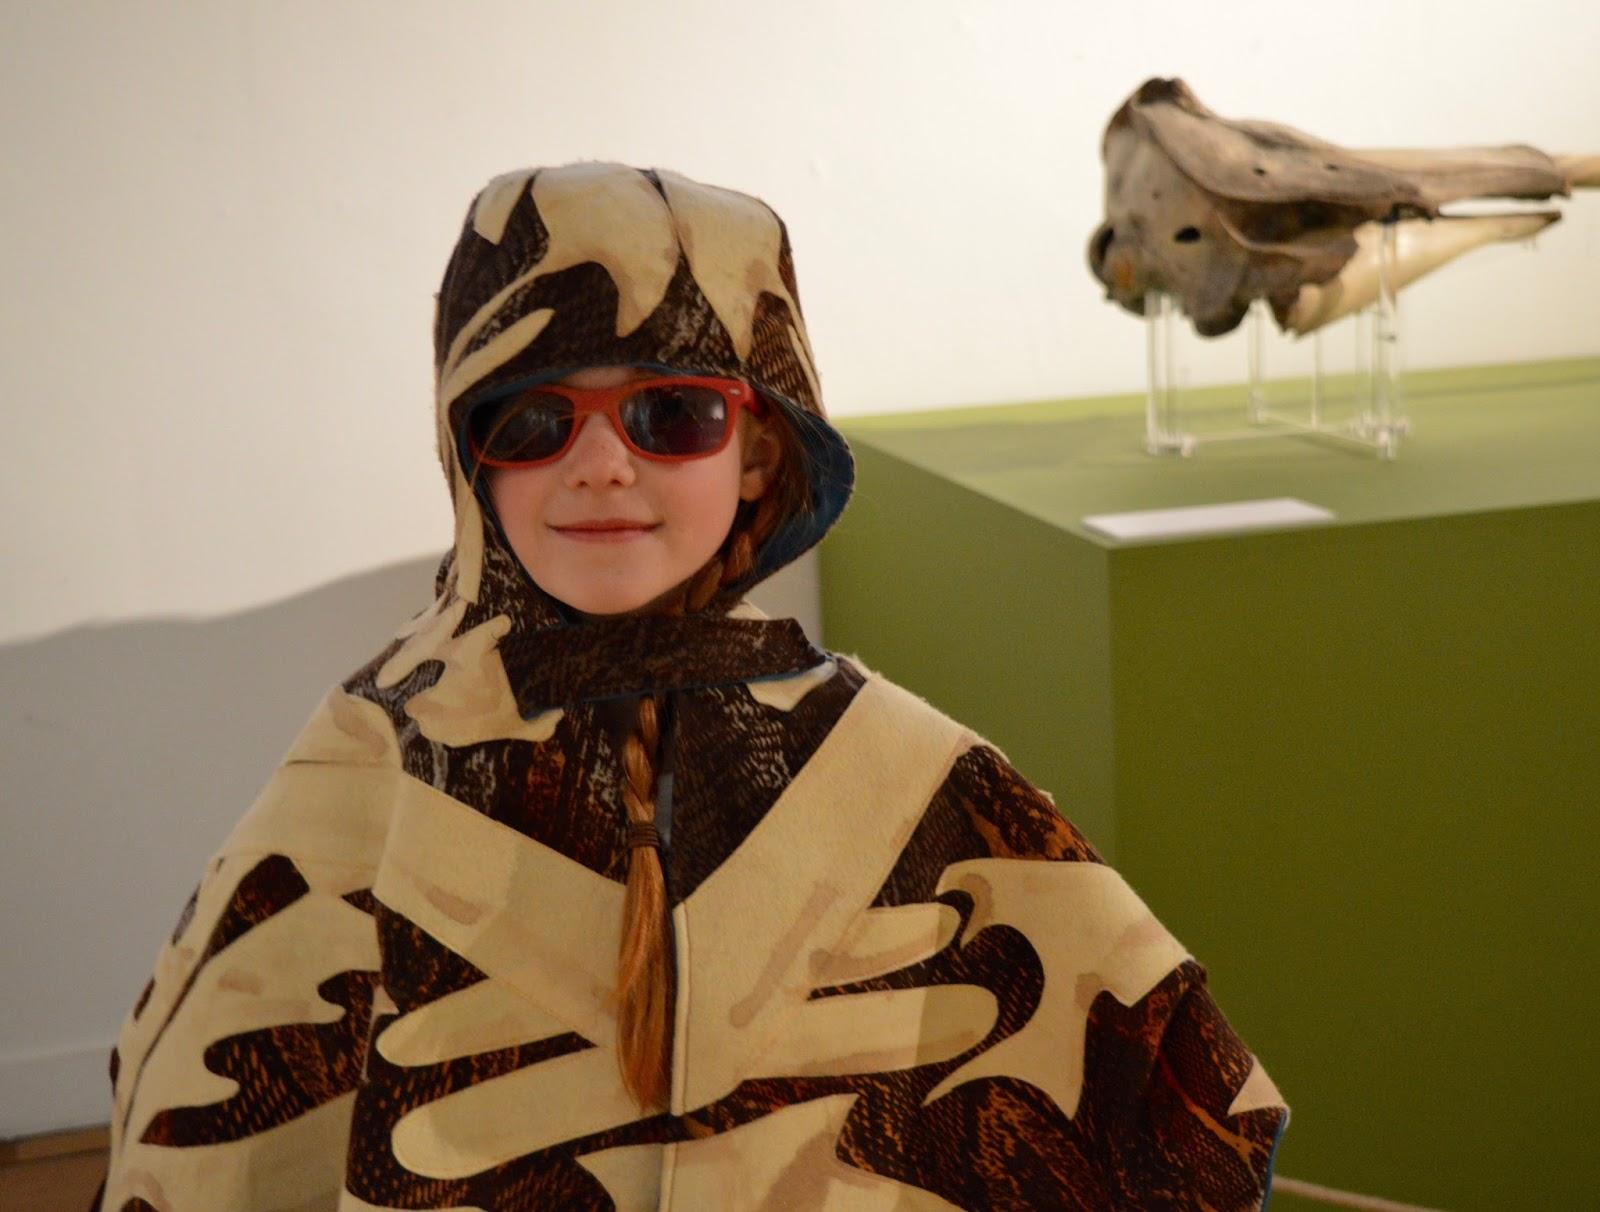 Bones Exhibition at Hancock Museum, Newcastle - Heidi dressed up